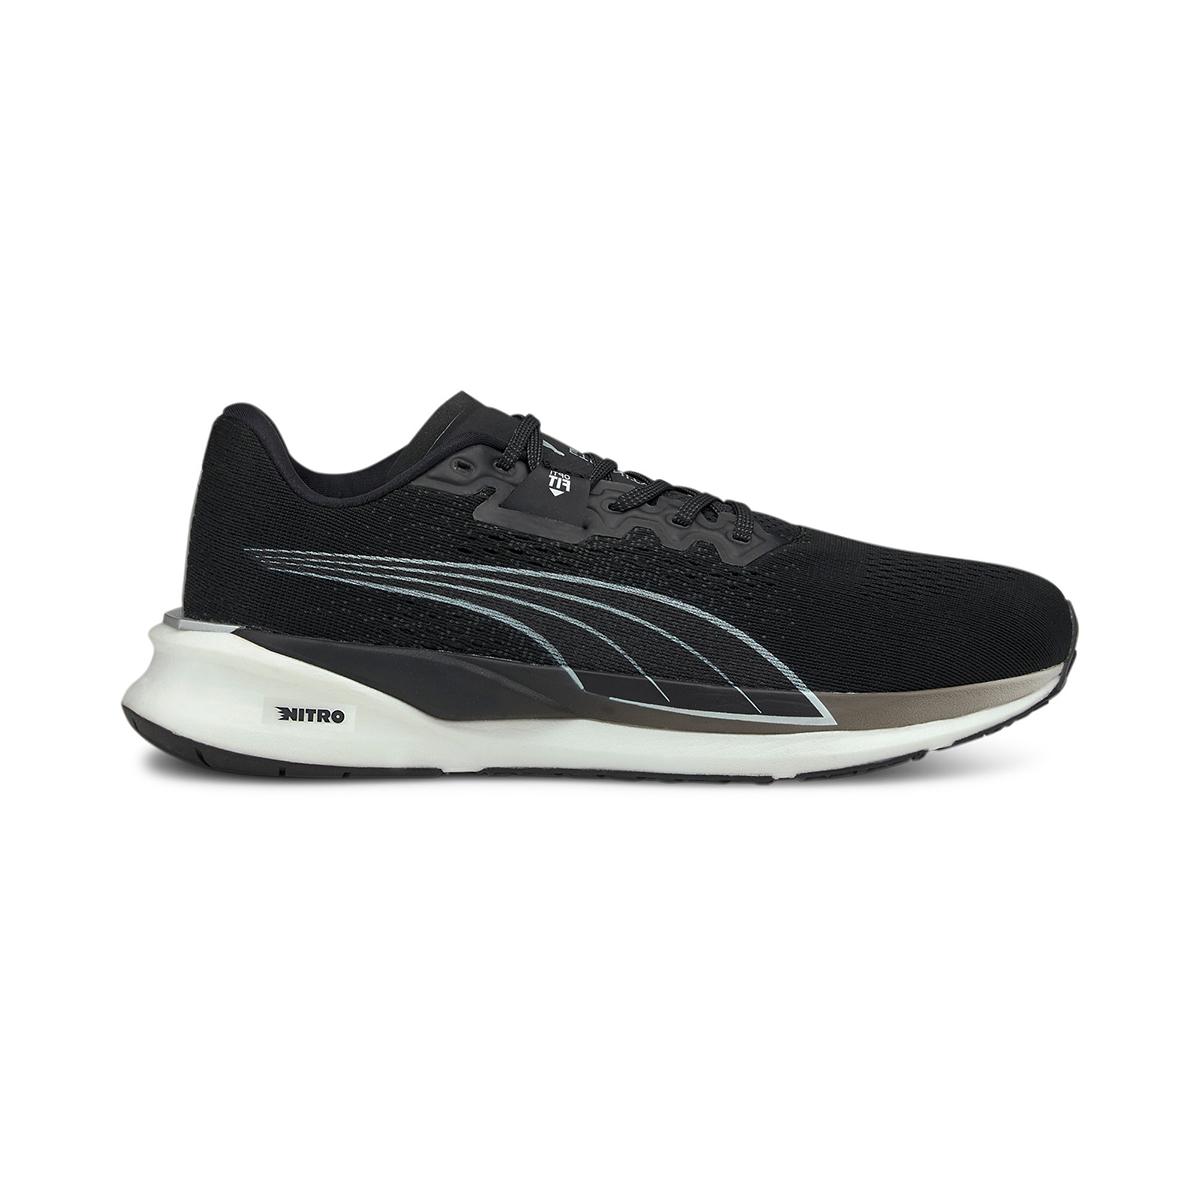 Men's Puma Eternity Nitro Running Shoe - Color: Puma Black - Size: 7 - Width: Regular, Puma Black, large, image 1